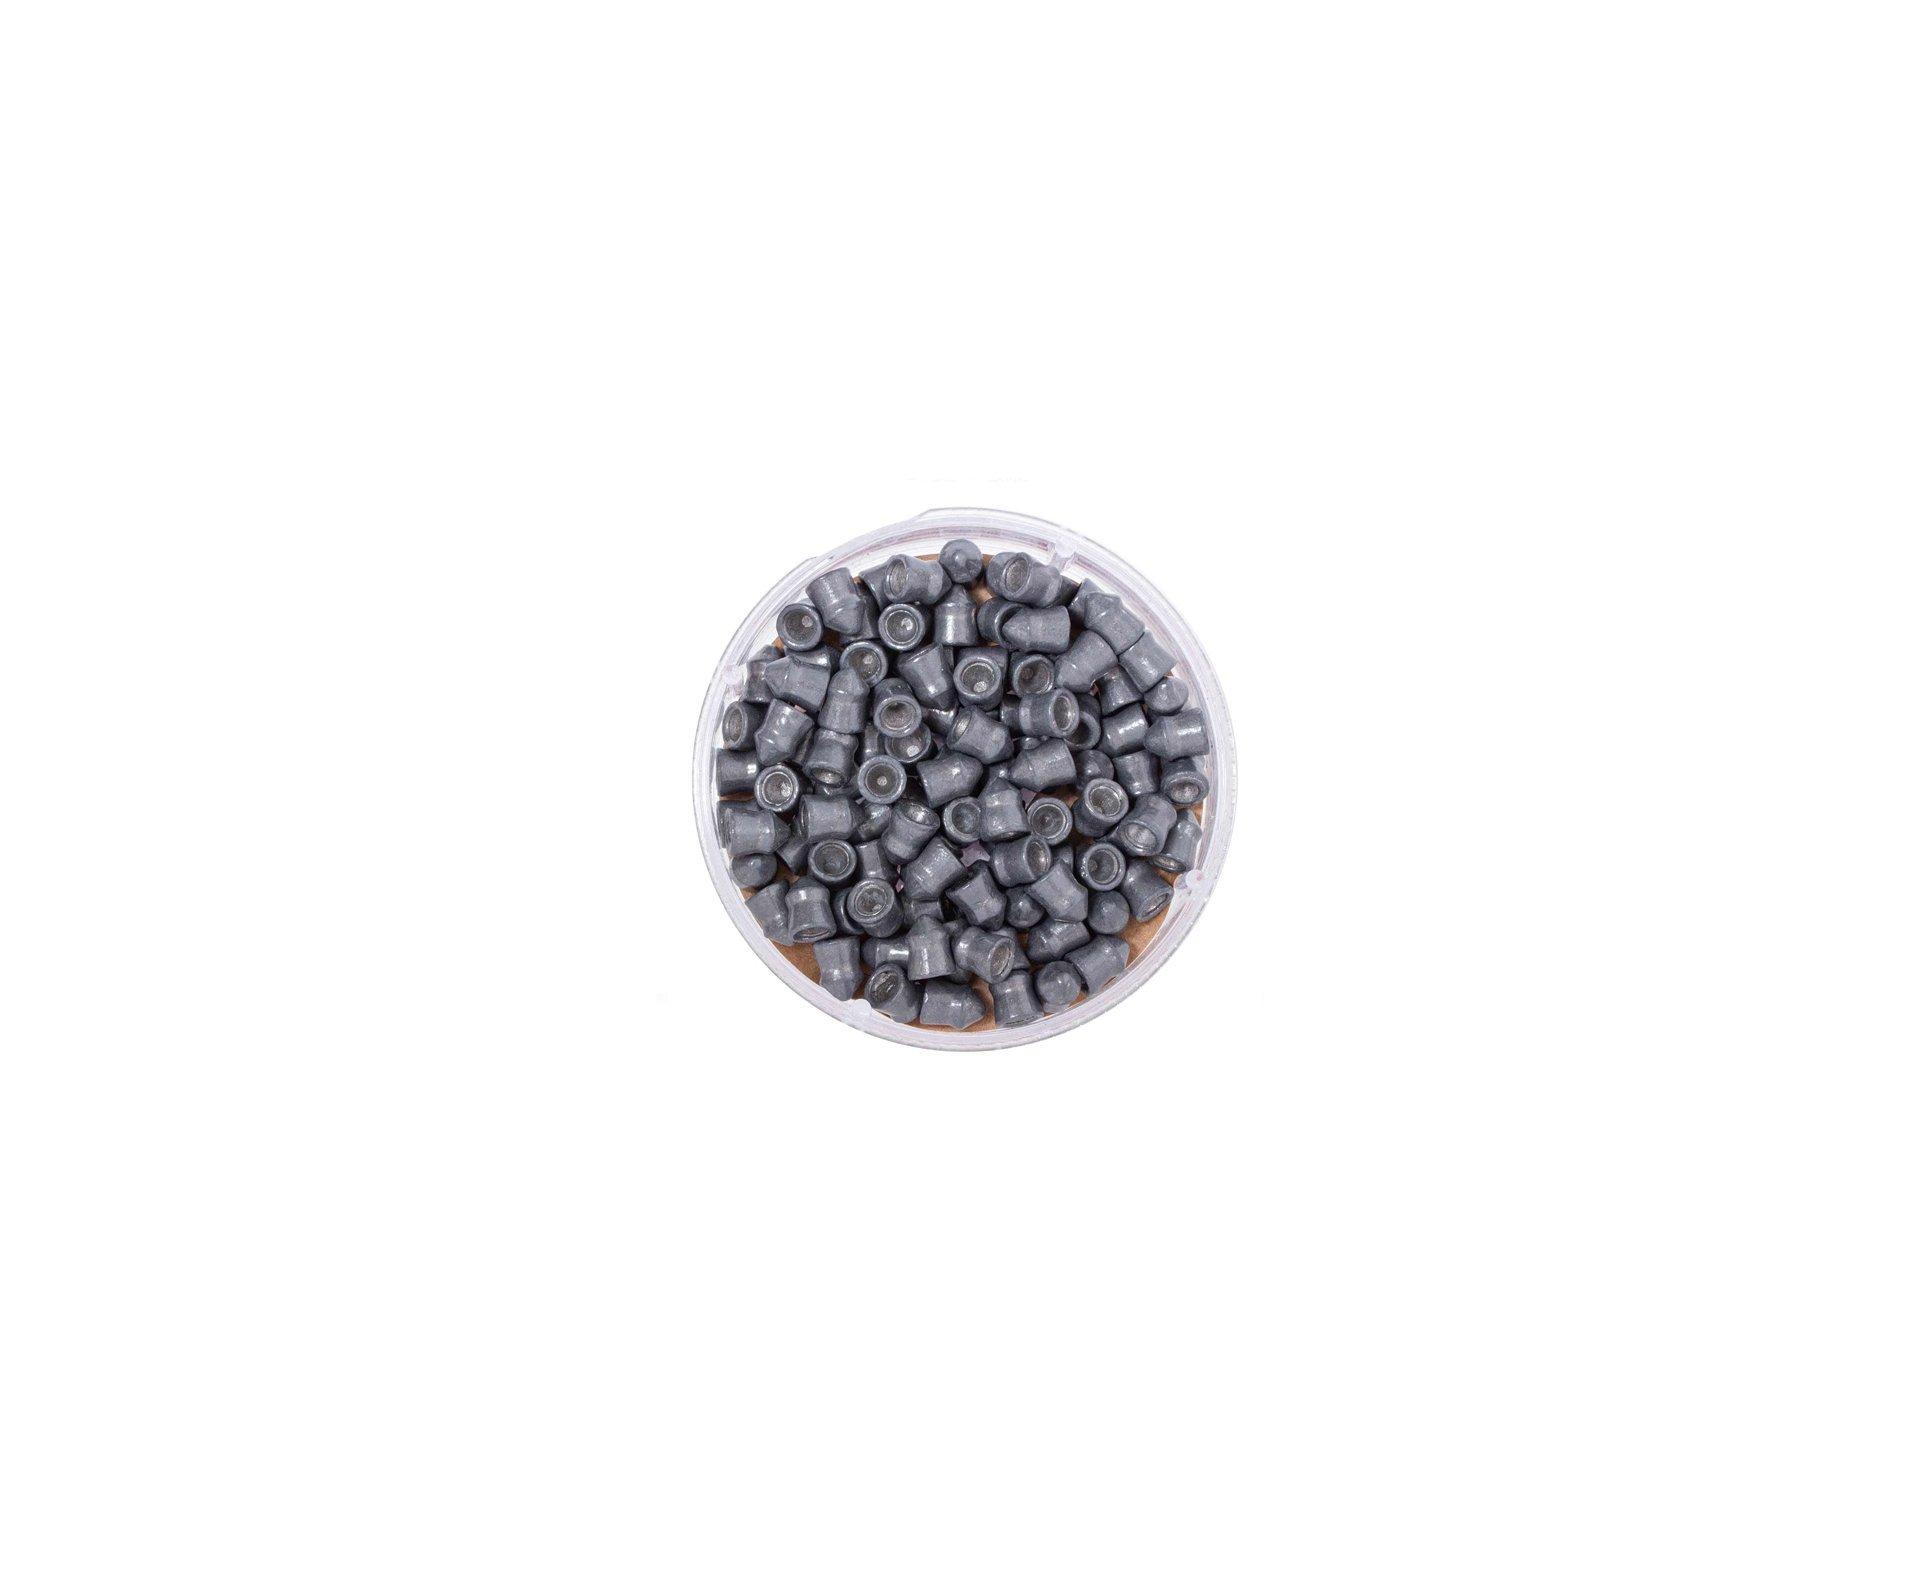 Chumbinho Impacto Calibre 6,0 Mm - 100 Unidades - Chakal